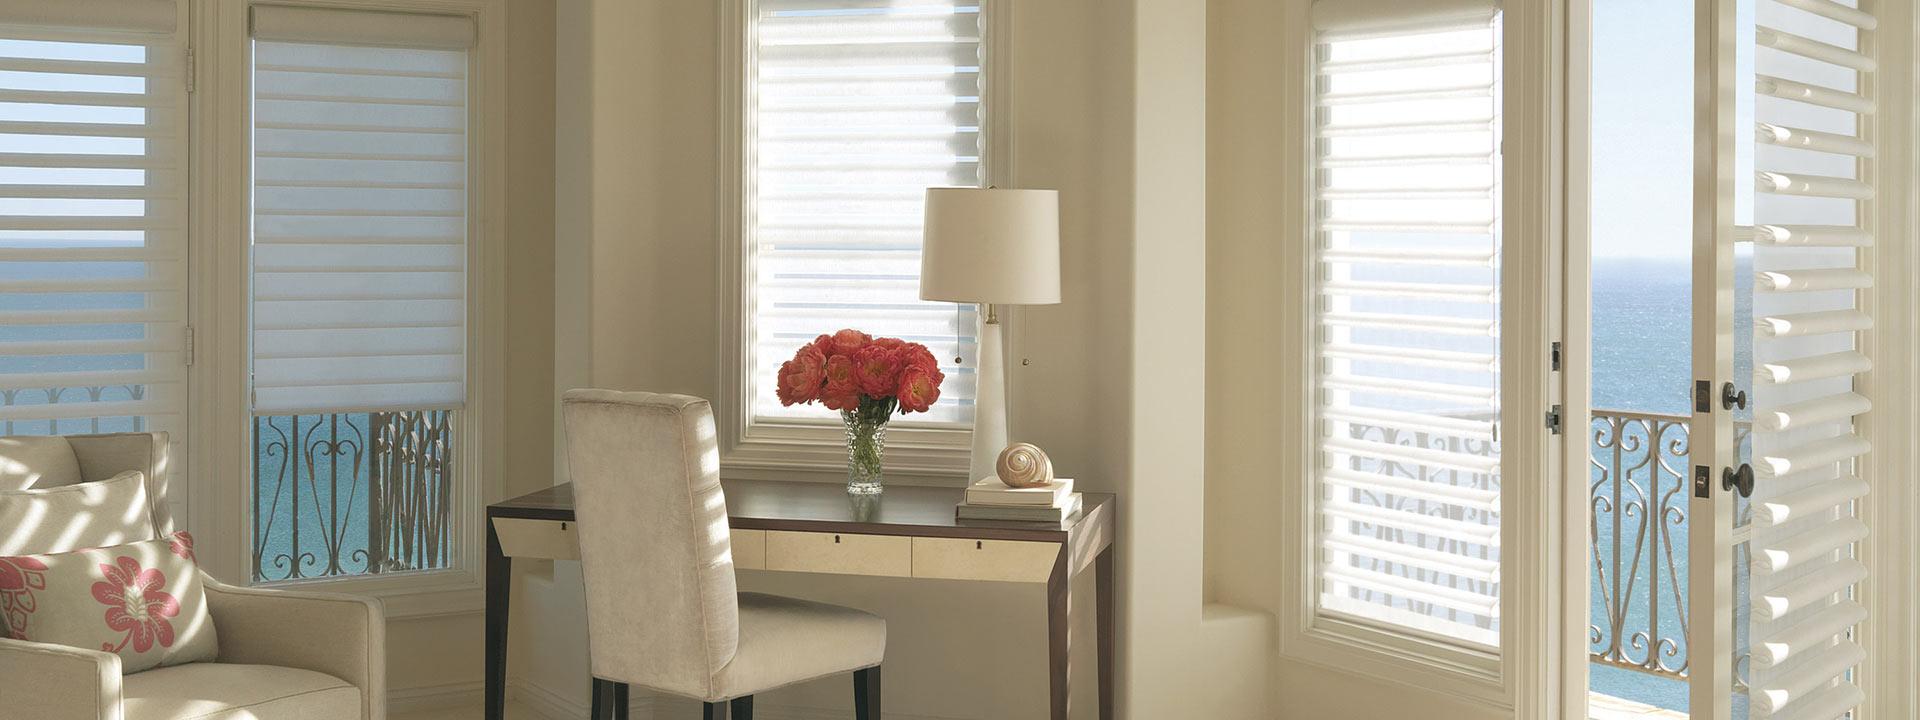 flair design furniture. kalamazoou0027s best interior design services and custom window treatments flair interiors furniture